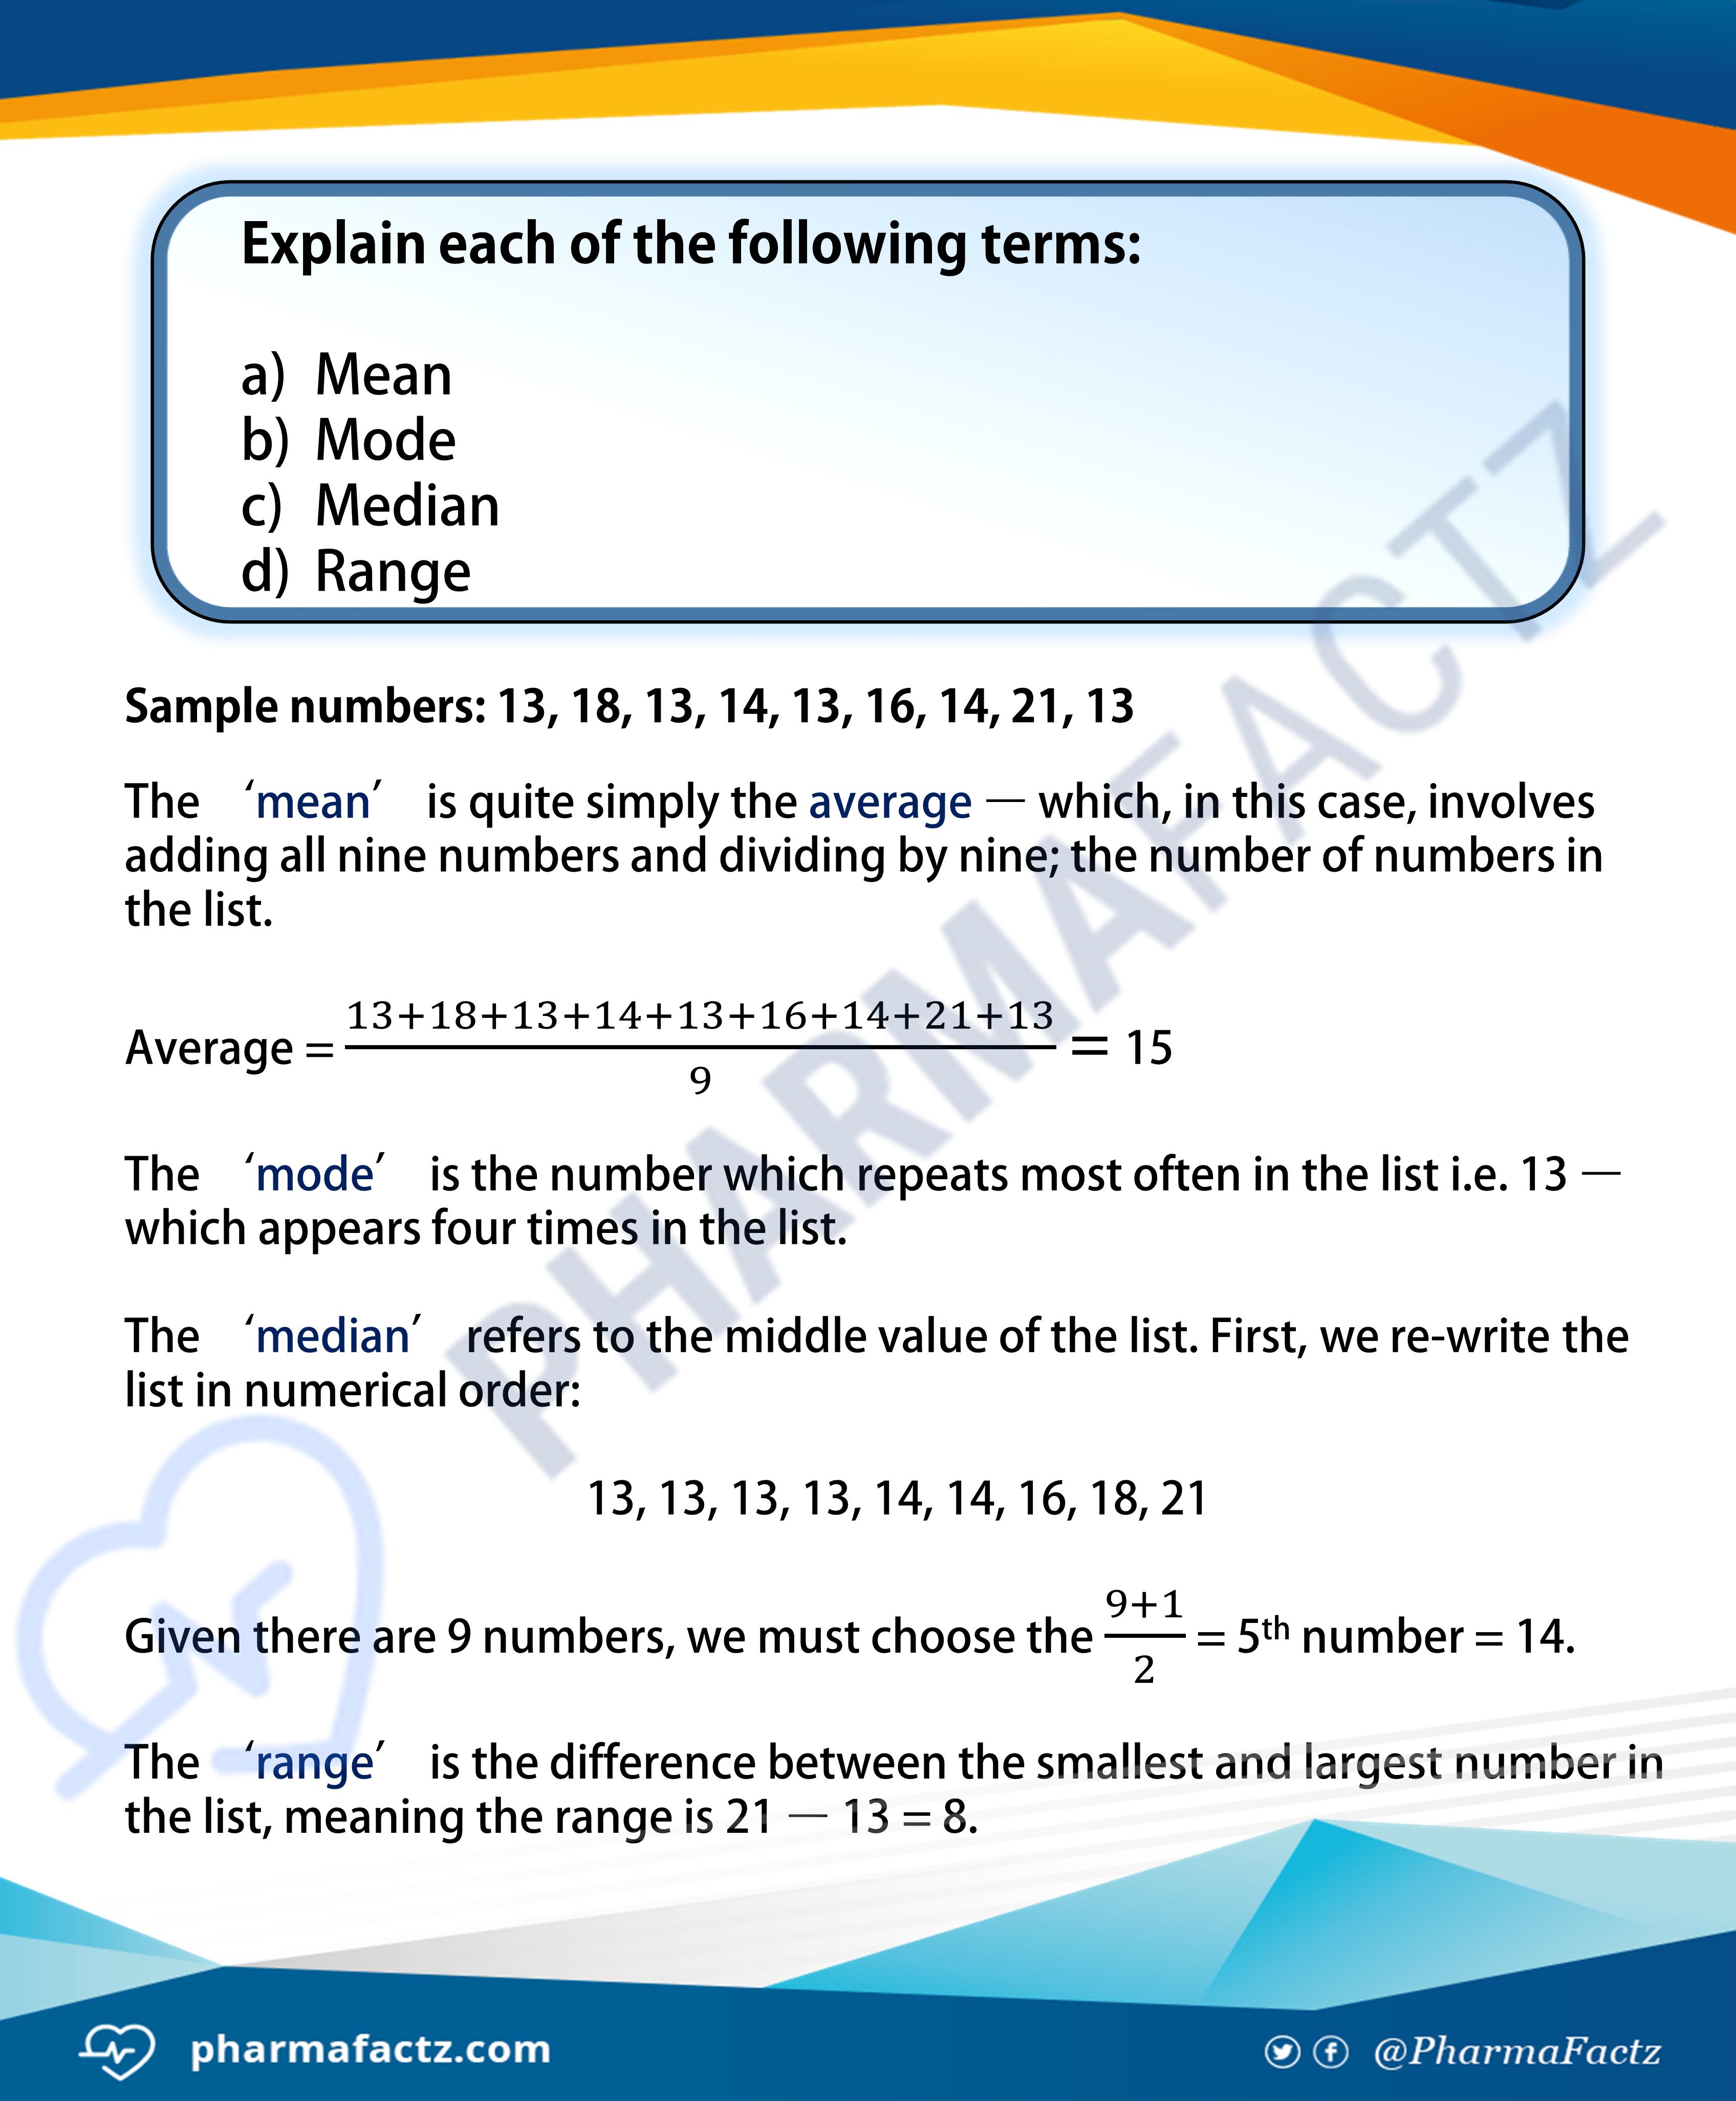 What is Mean, Mode, Median & Range?